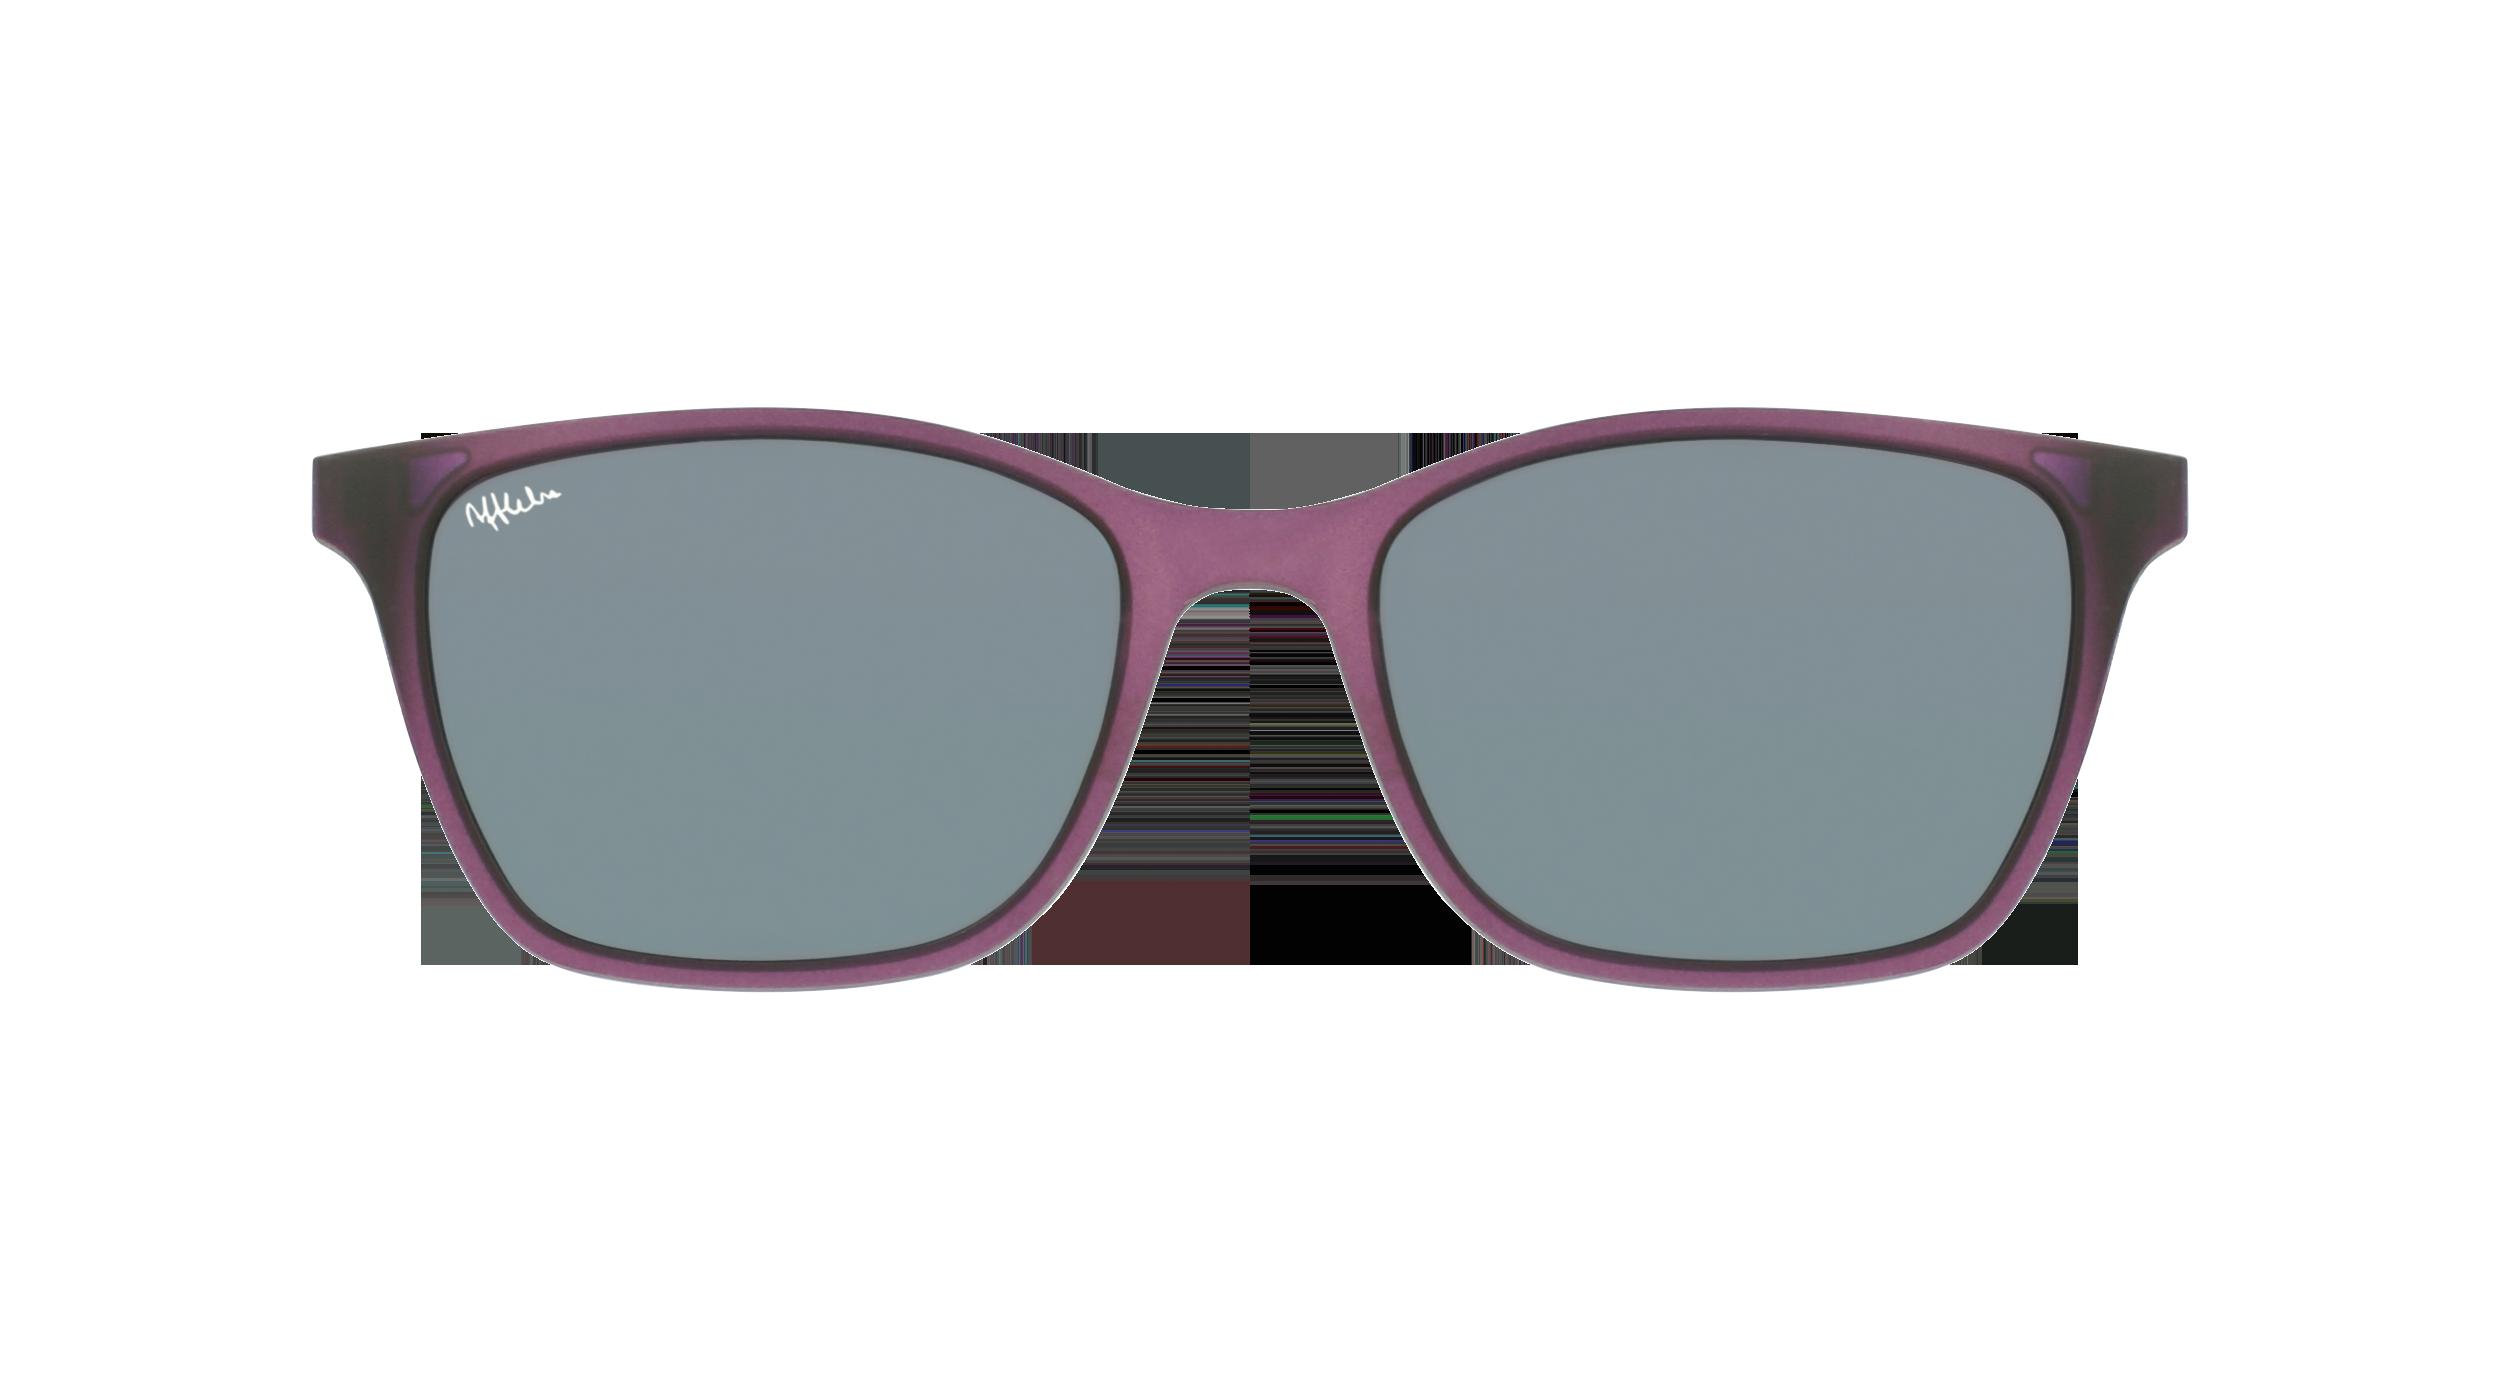 afflelou/france/products/smart_clip/clips_glasses/07630036457542.png